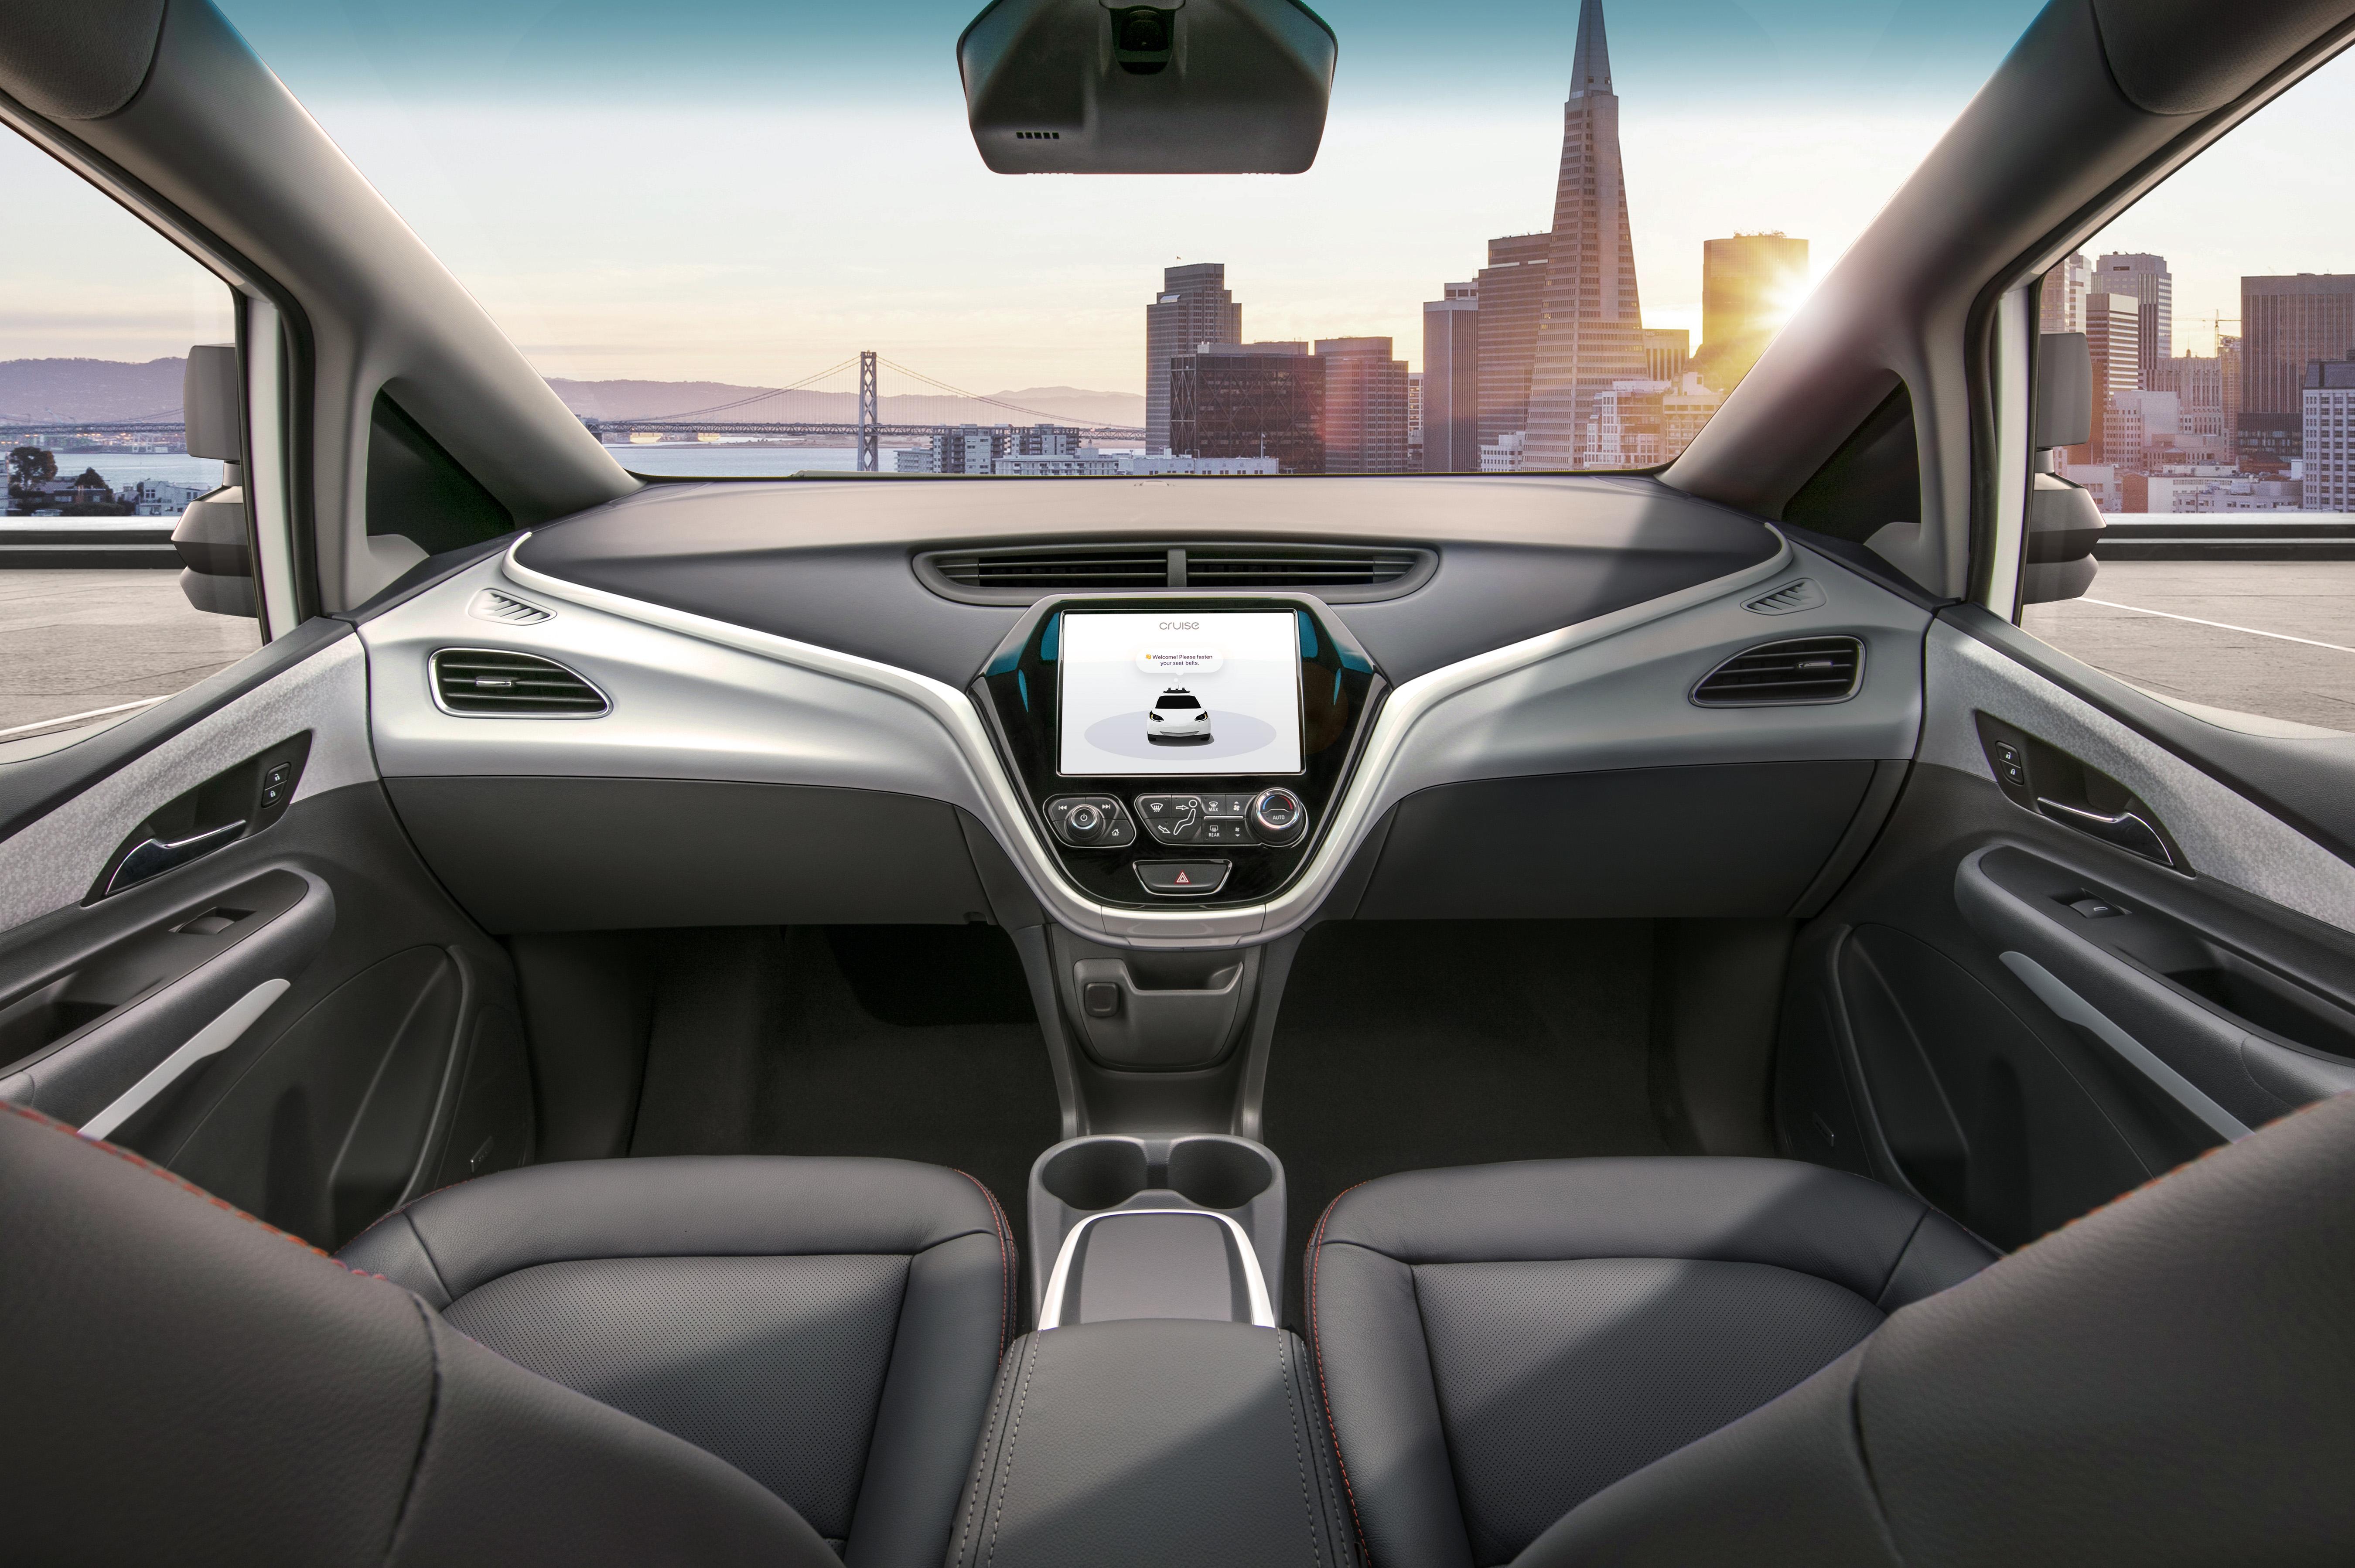 3 Top Driverless Car Stocks The Motley Fool